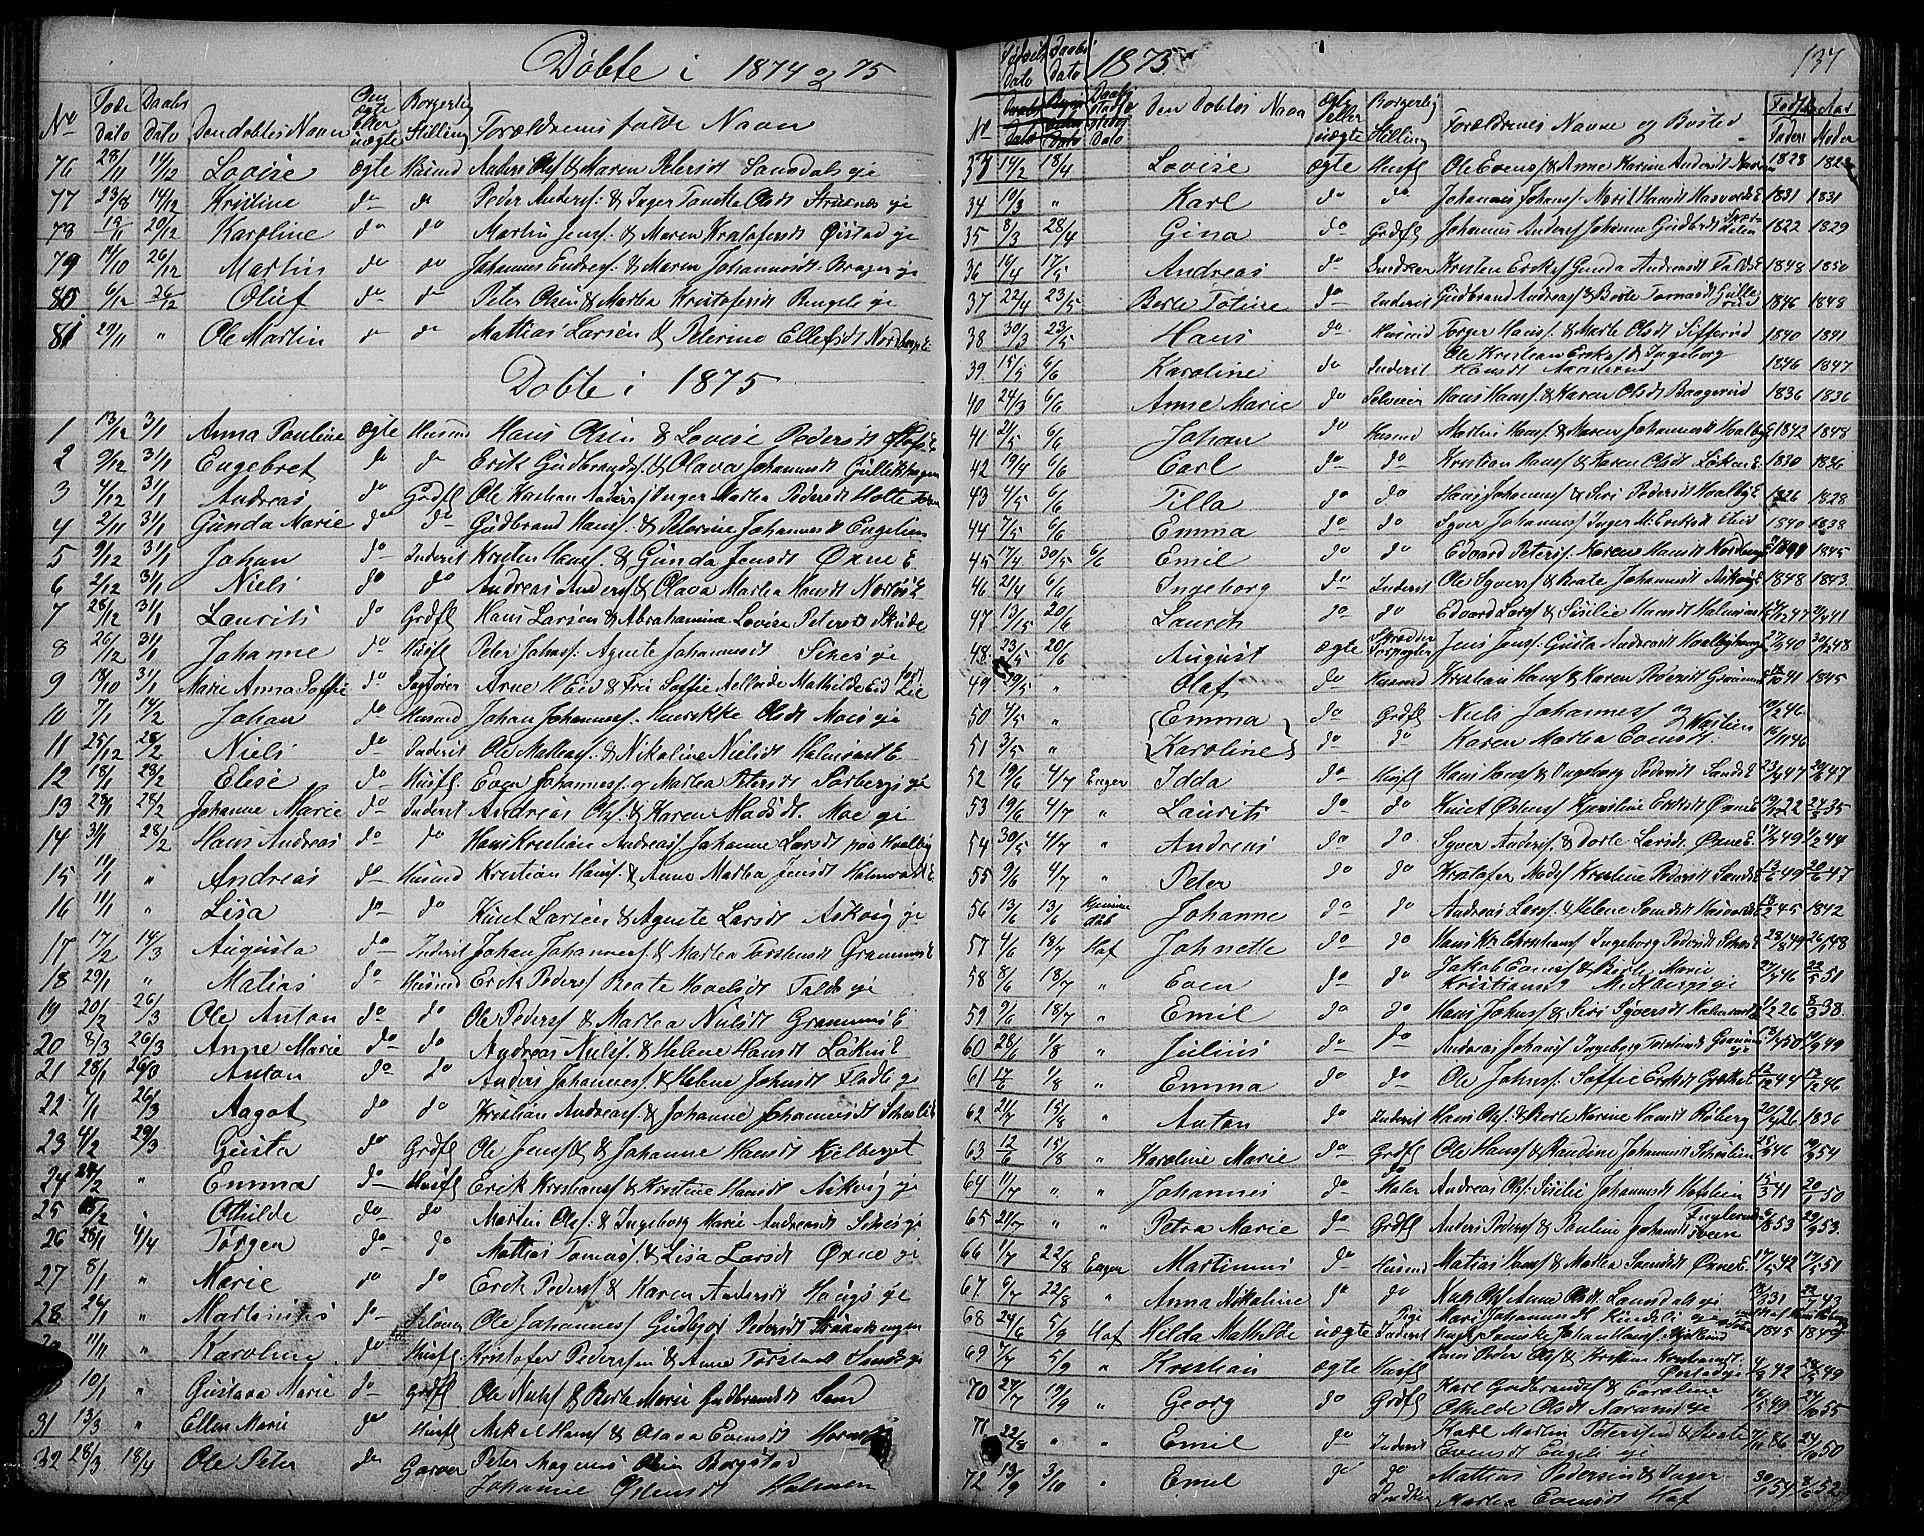 SAH, Søndre Land prestekontor, L/L0001: Klokkerbok nr. 1, 1849-1883, s. 137